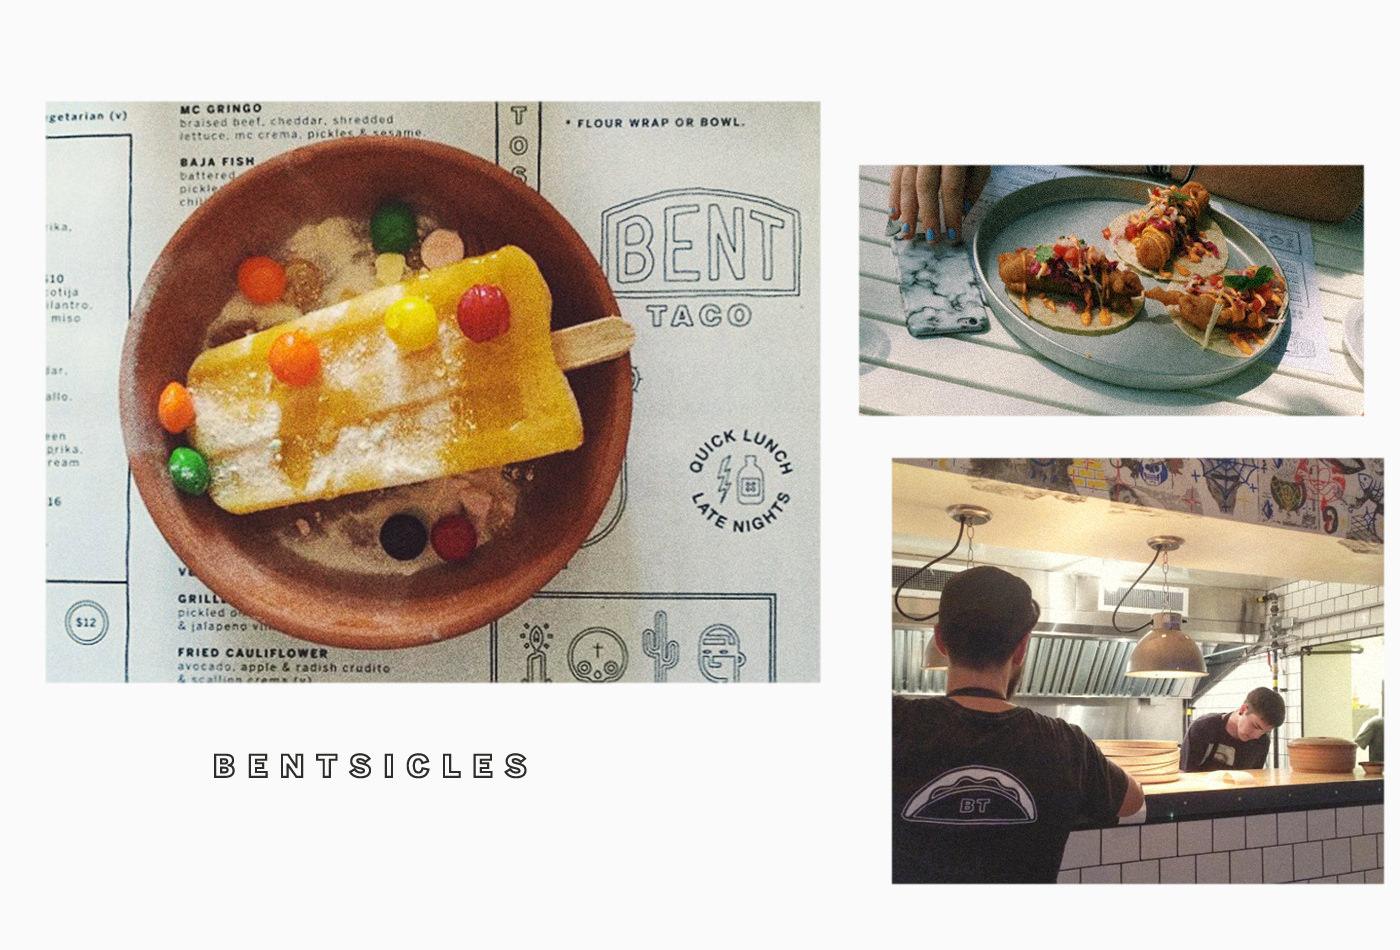 benttaco-bentsicles-popsicles-vacaliebres-branding-mexican-restaurant-collingwood-toronto-ontario-canada